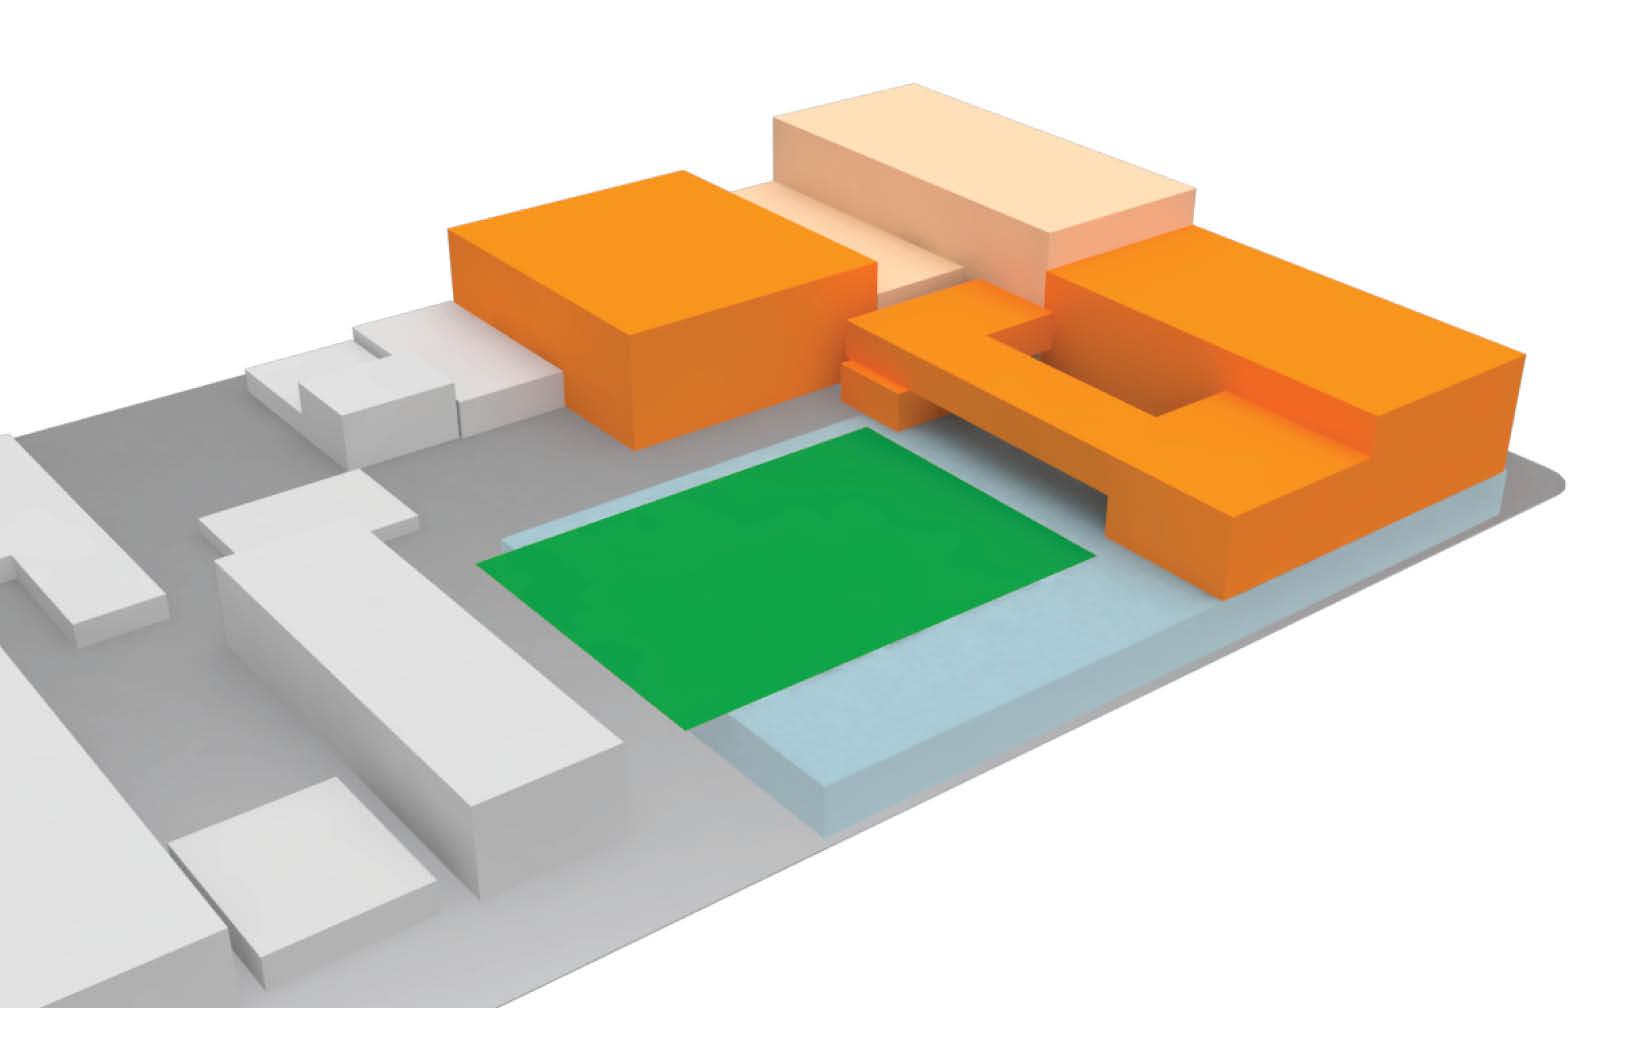 Aerial view of 3D model looking northwest